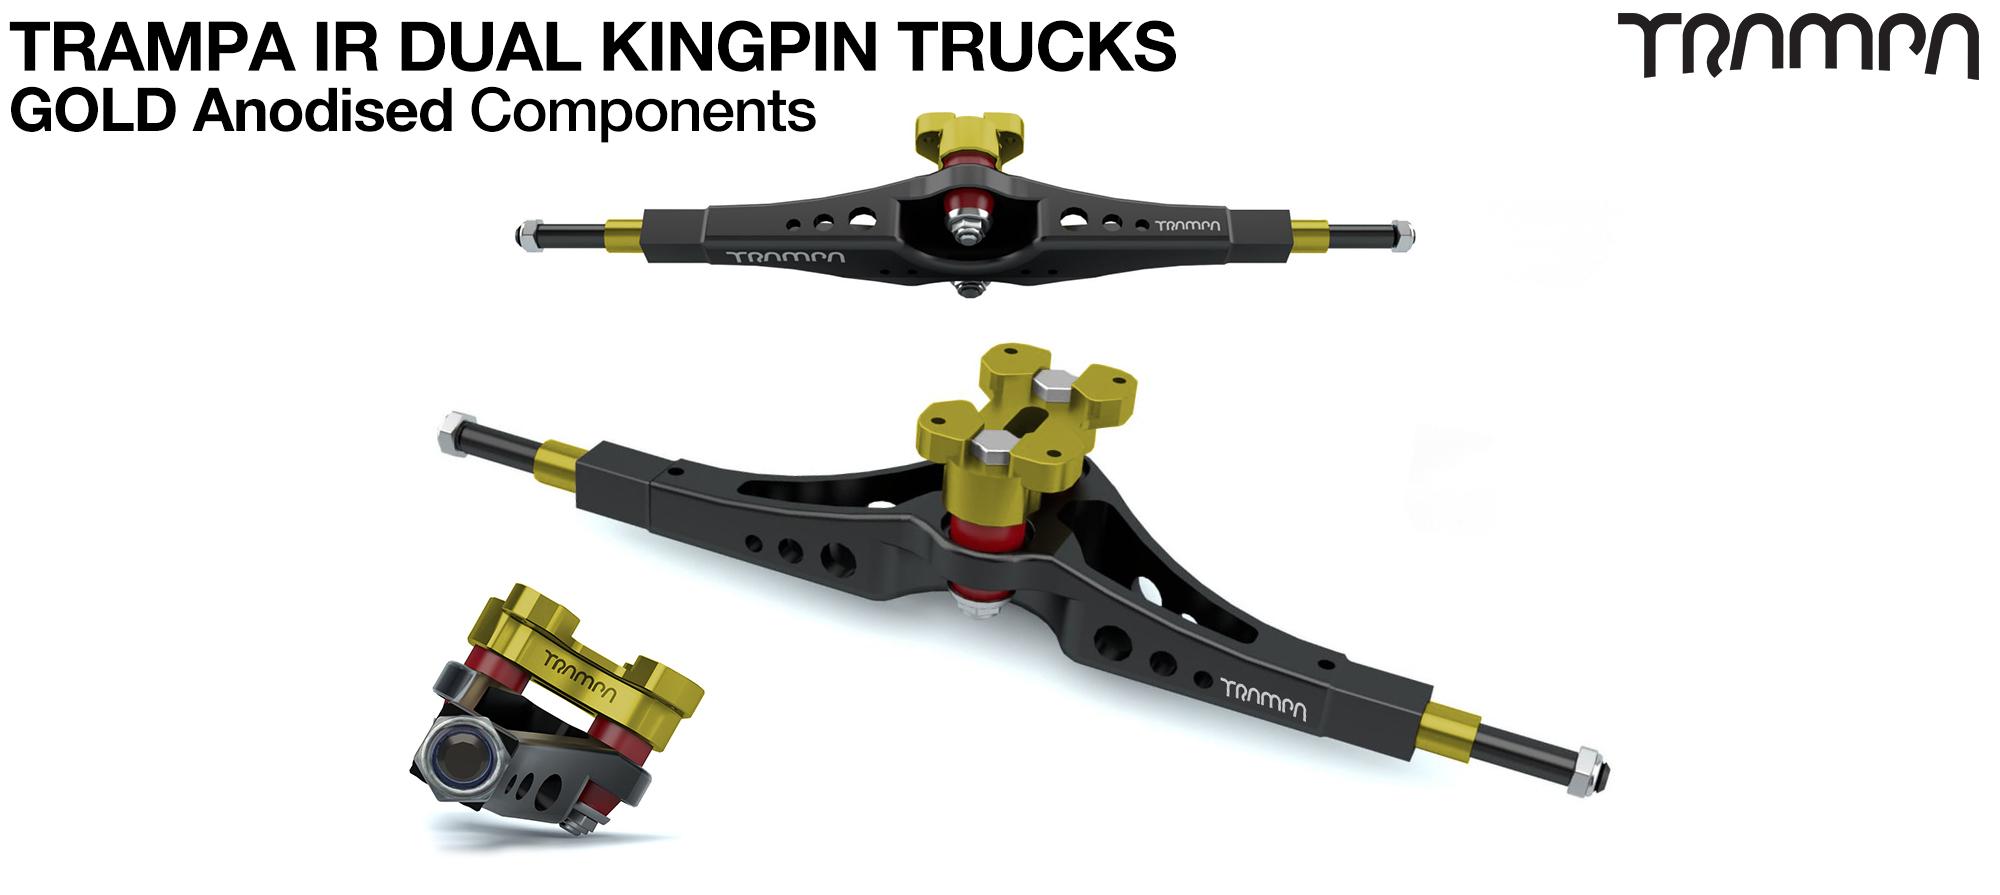 TRAMPA IR Double Kingpinned Skate Style Trucks fit every 19.1mm Motor Mount TRAMPA offers - GOLD